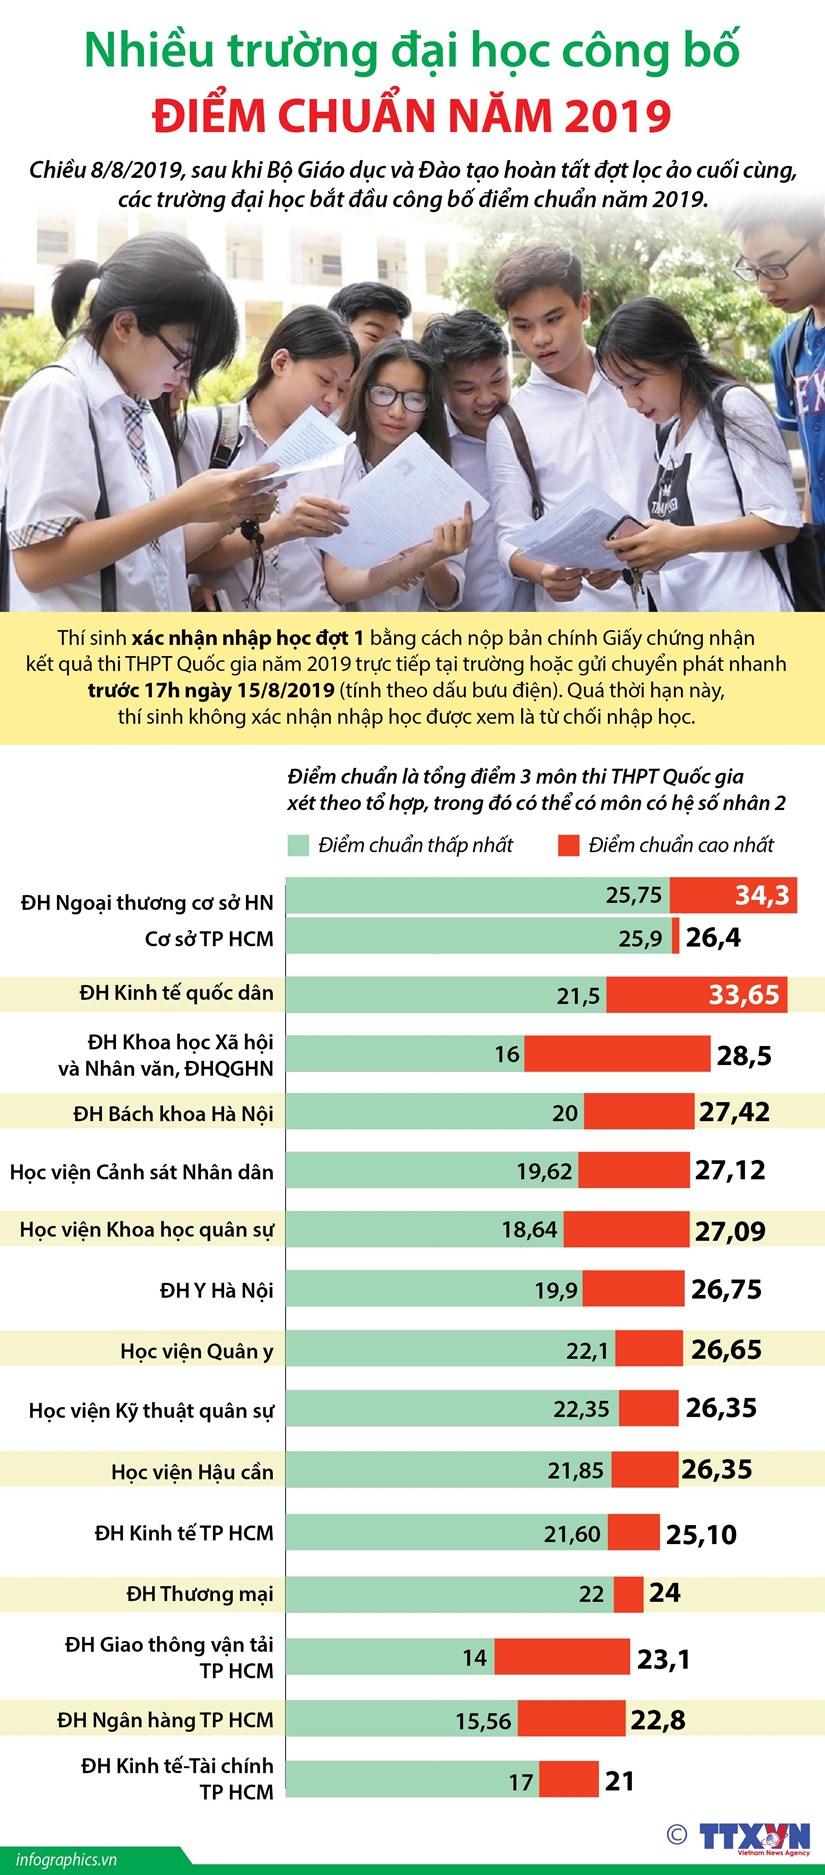 infographics nhieu truong dai hoc cong bo diem chuan nam 2019